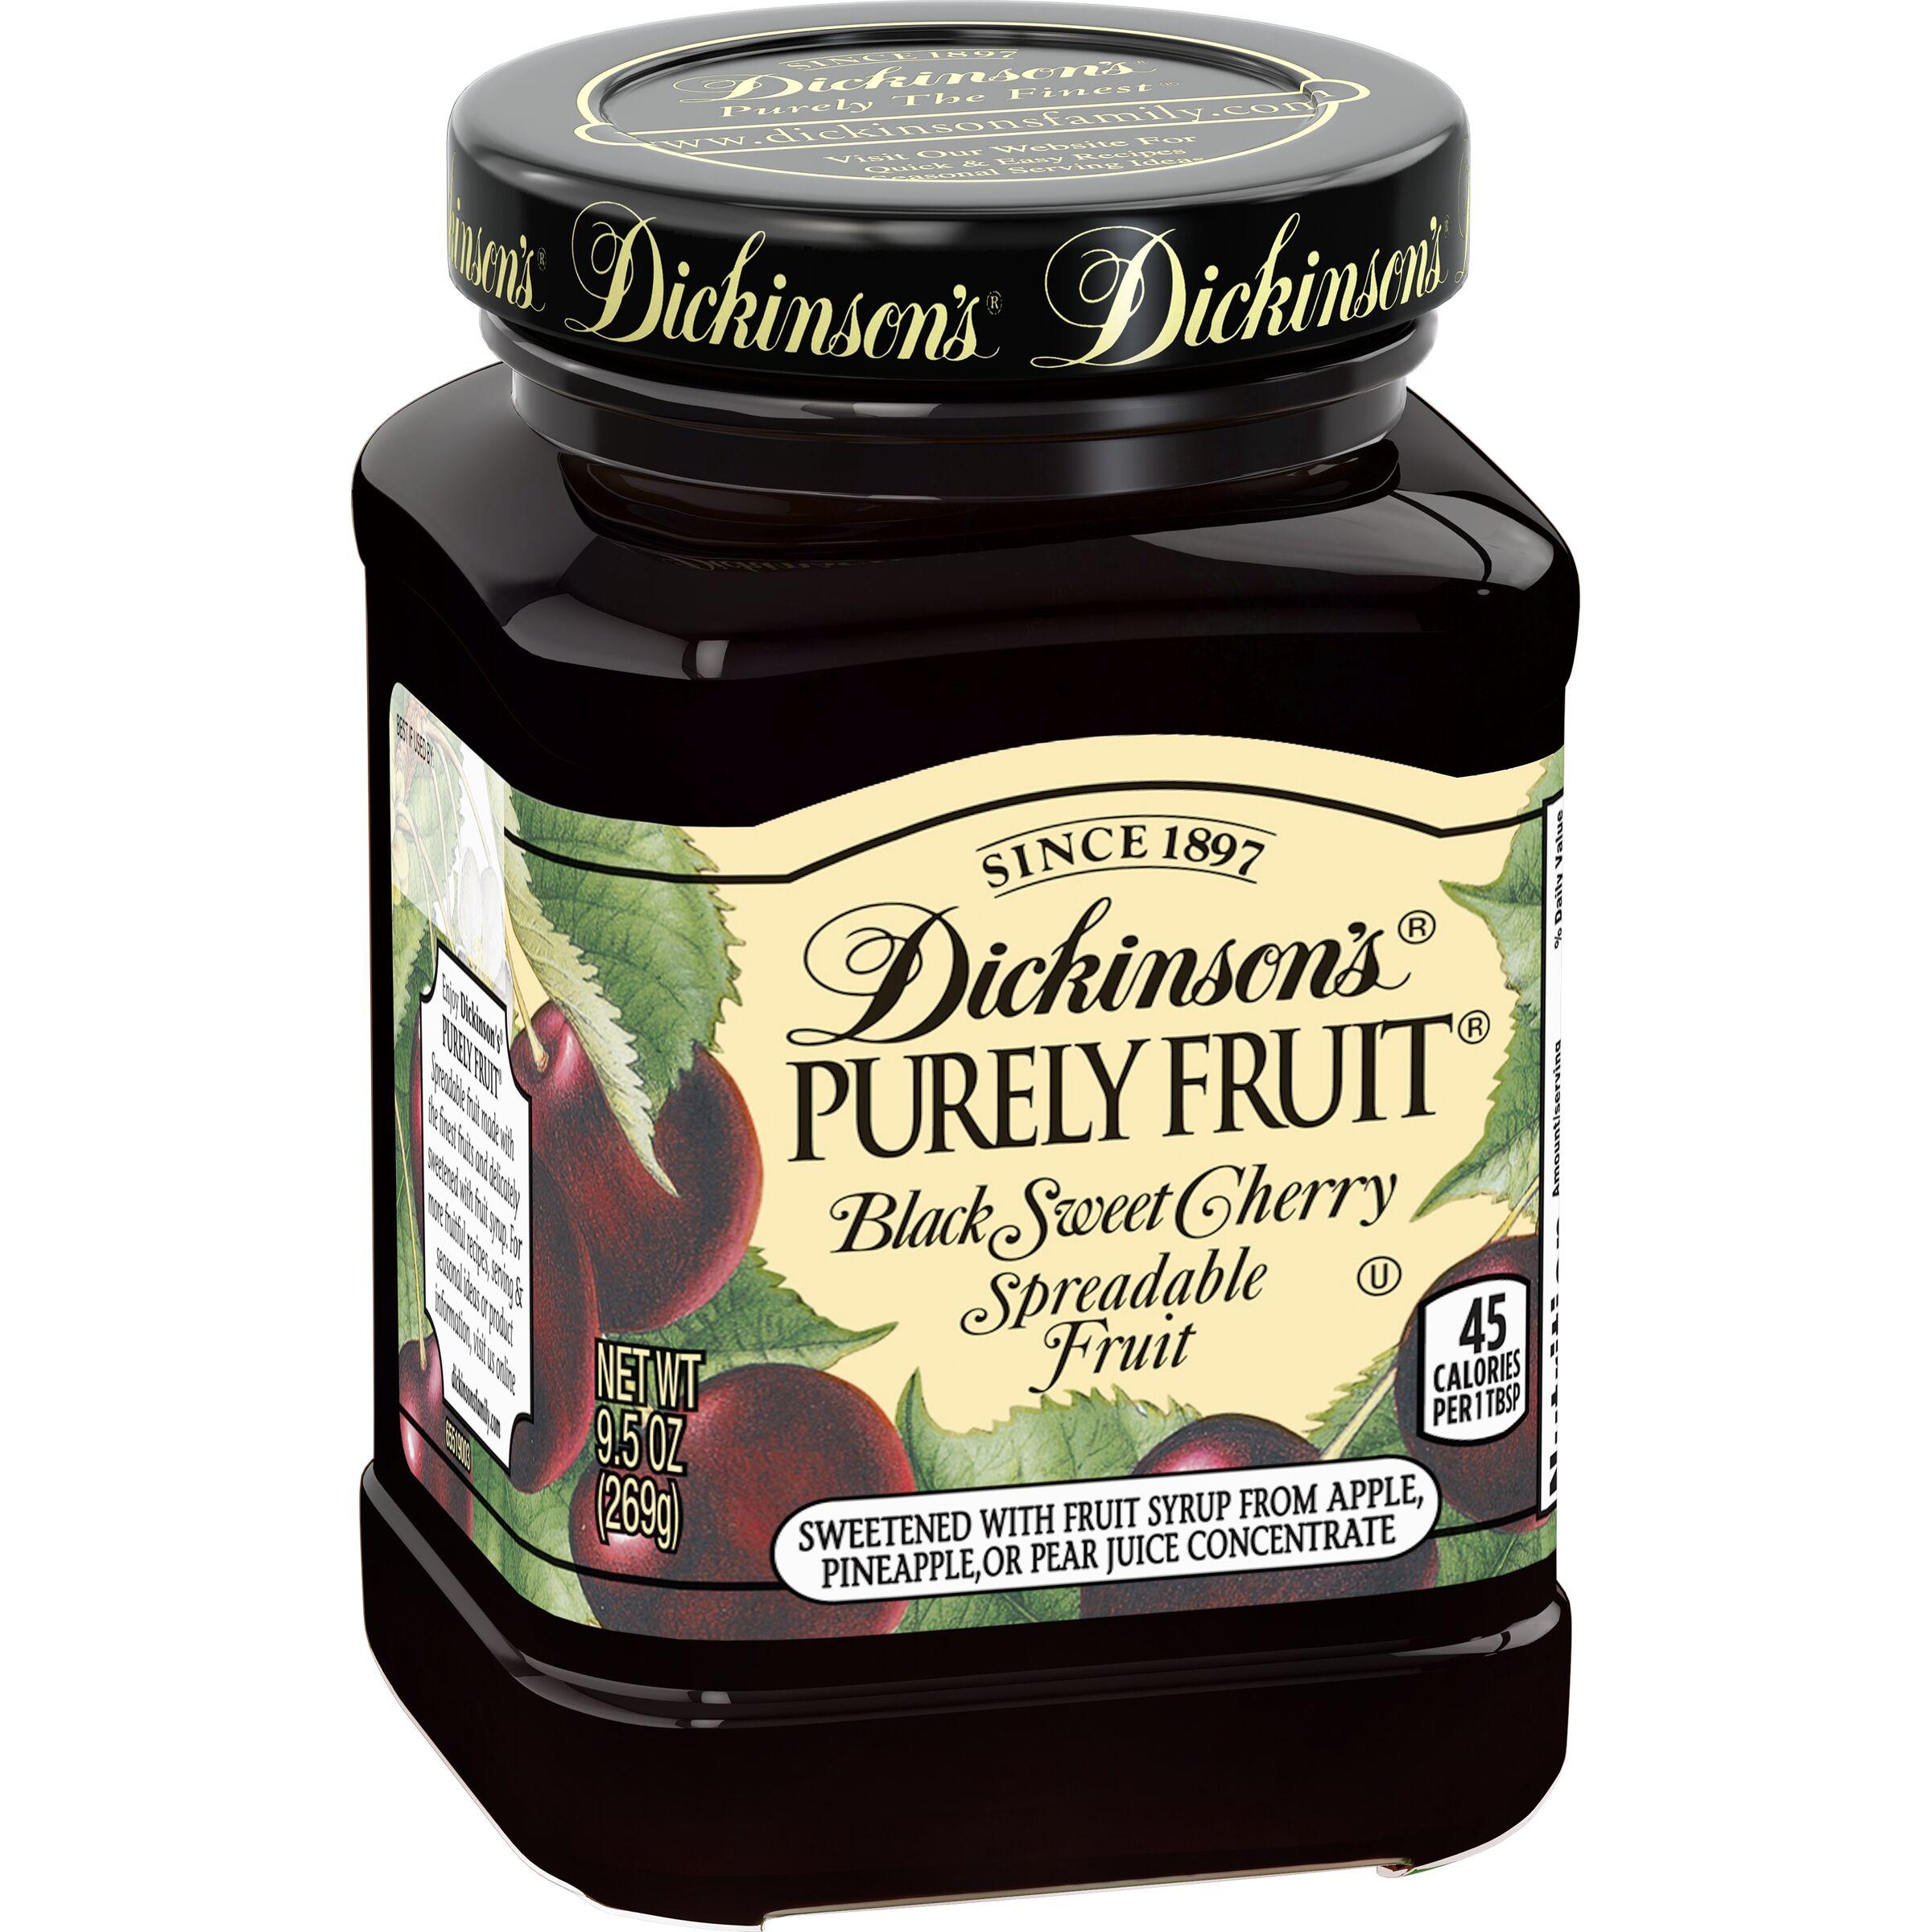 Dickinson's Purely Fruit Black Sweet Cherry Spreadable Fruit